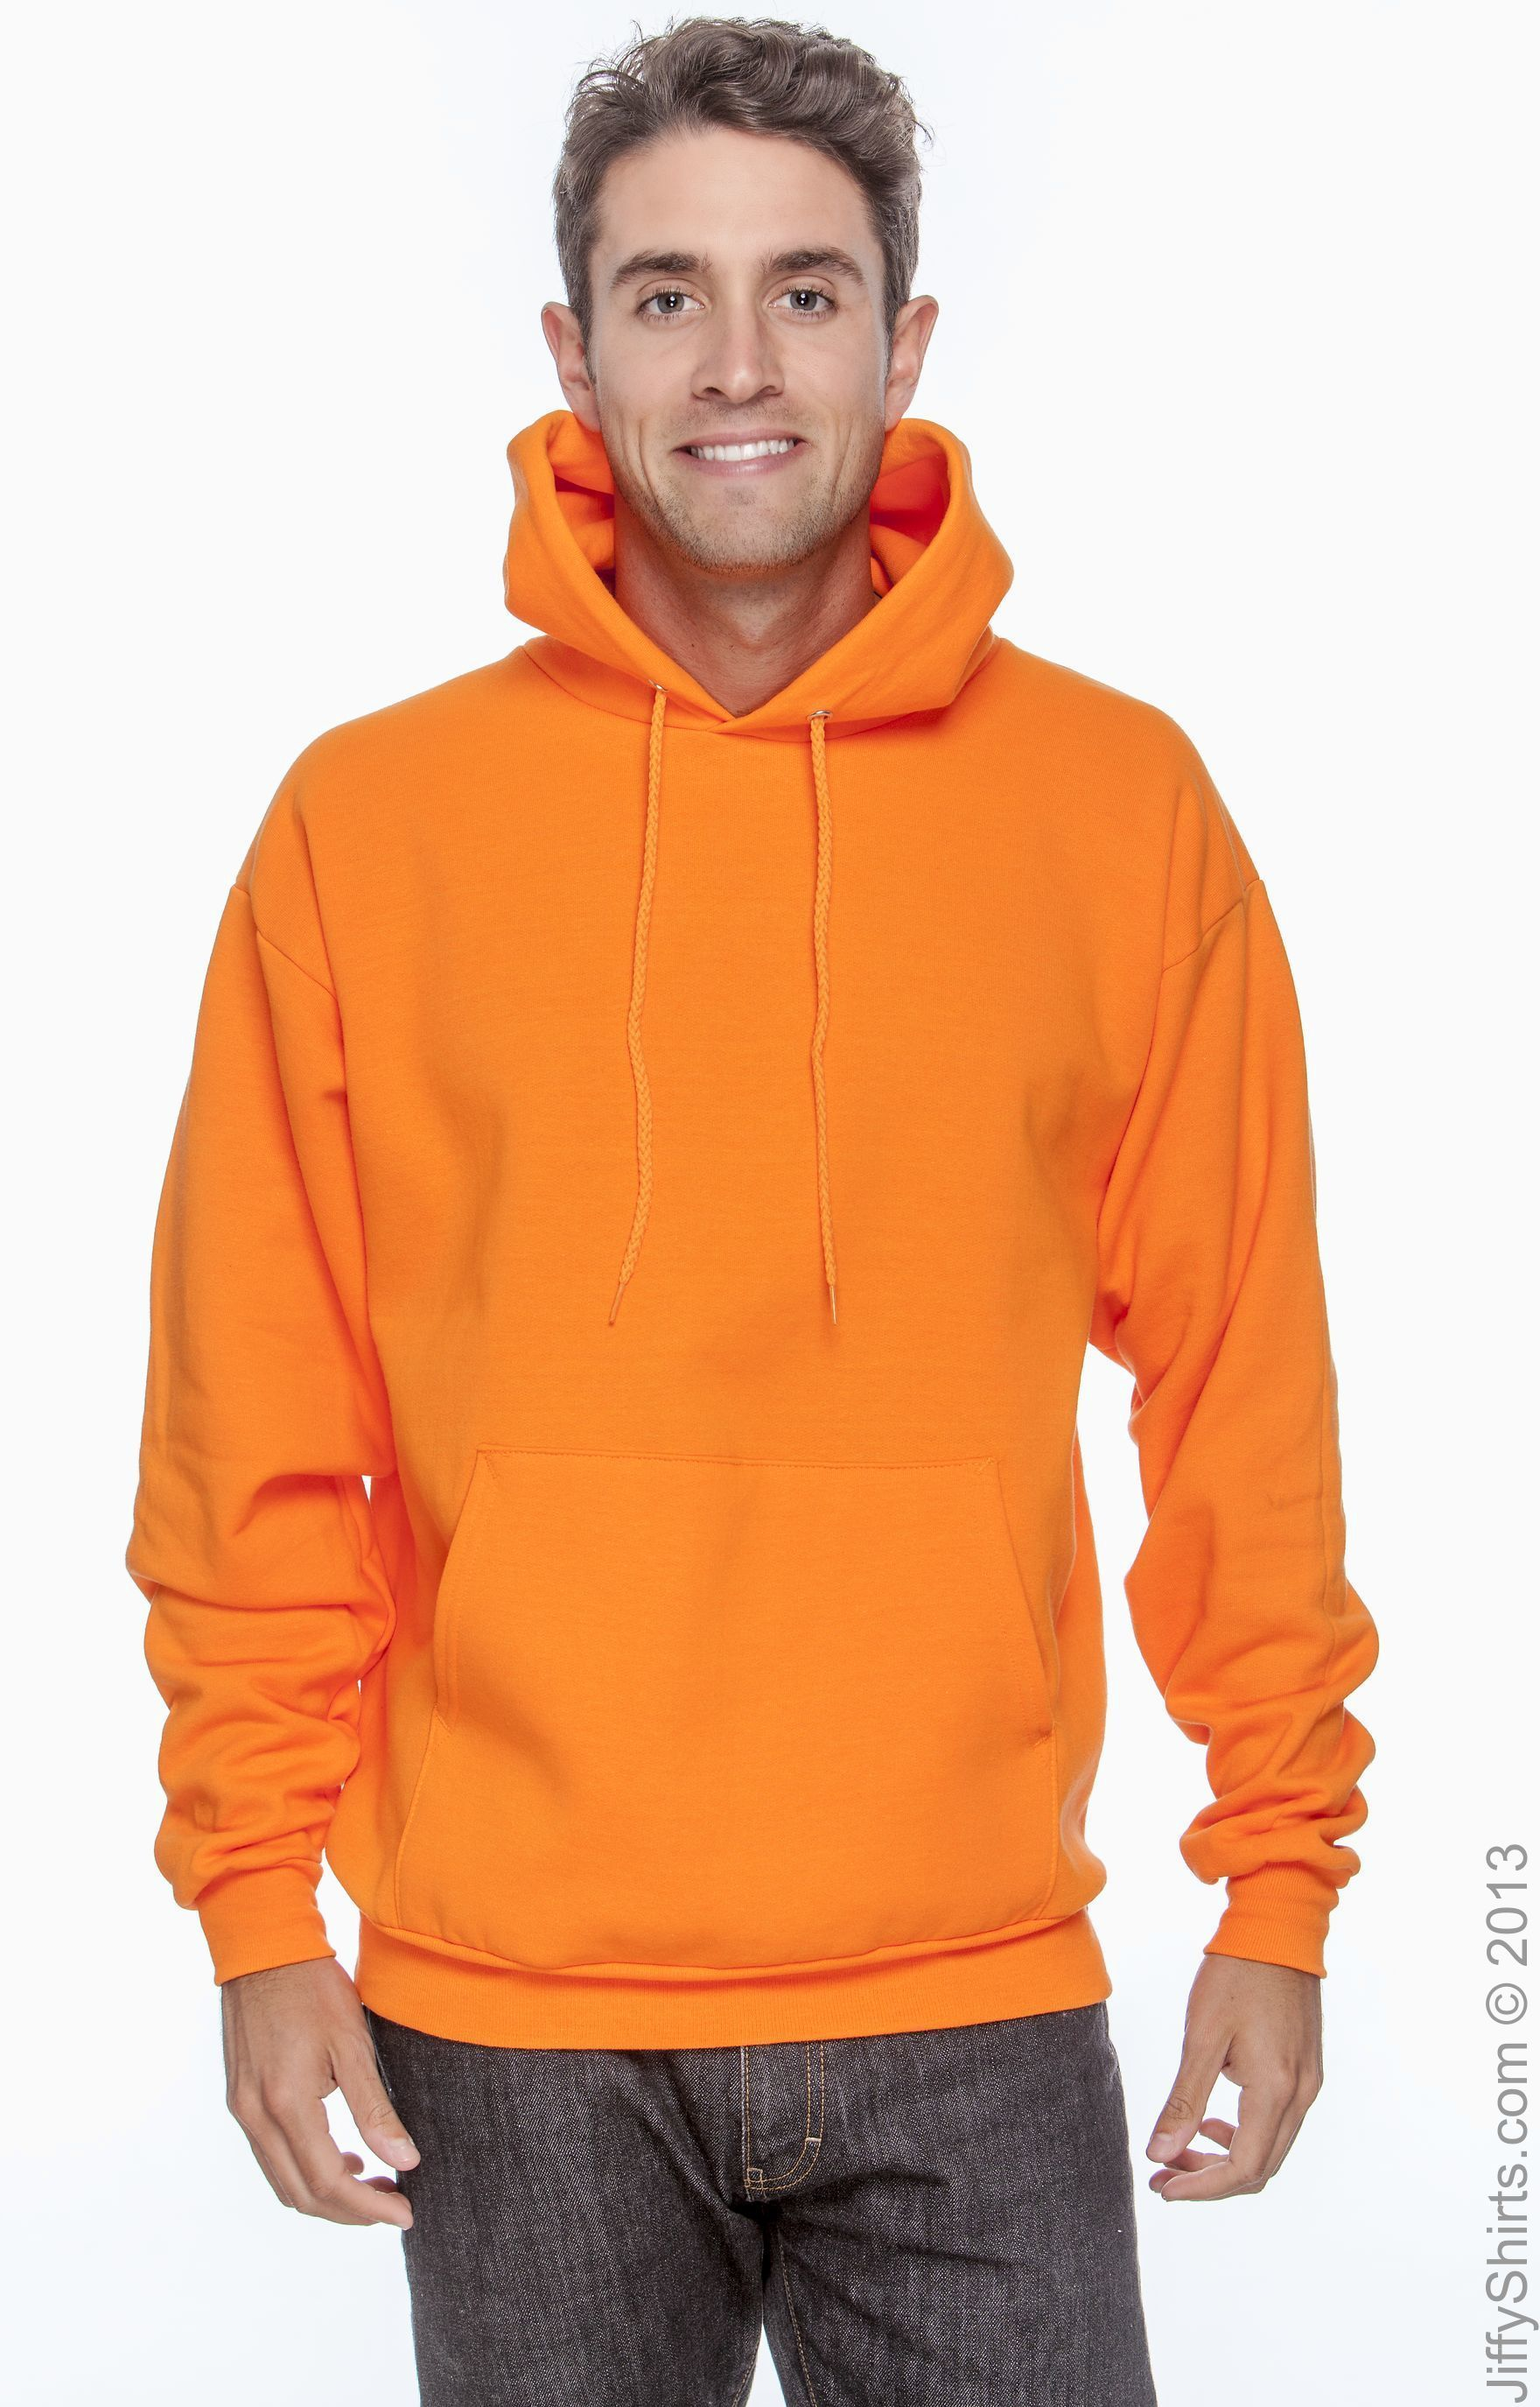 1 Orange Hanes P170 Mens EcoSmart Hooded Sweatshirt XL 1 Ash